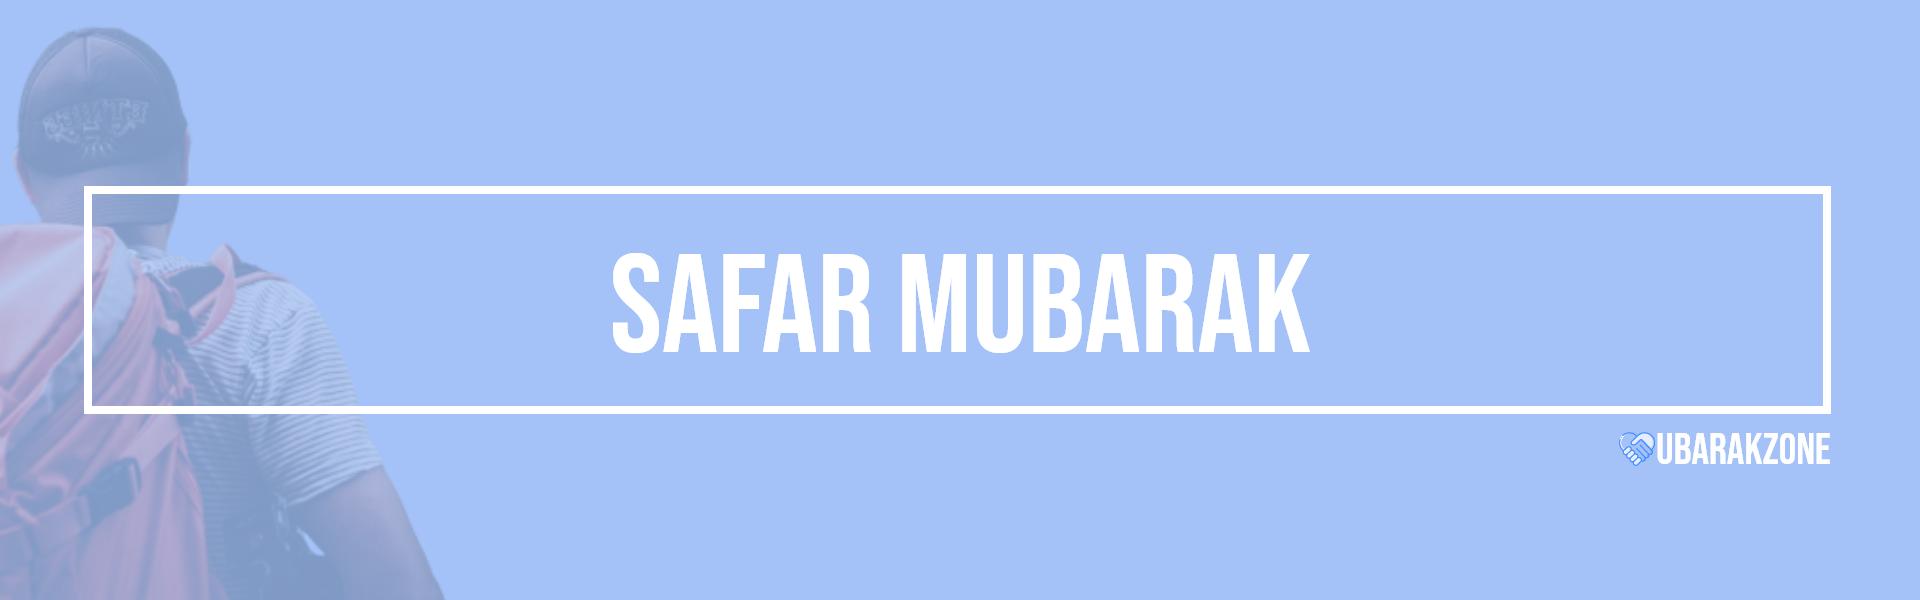 safar mubarak wishes messages